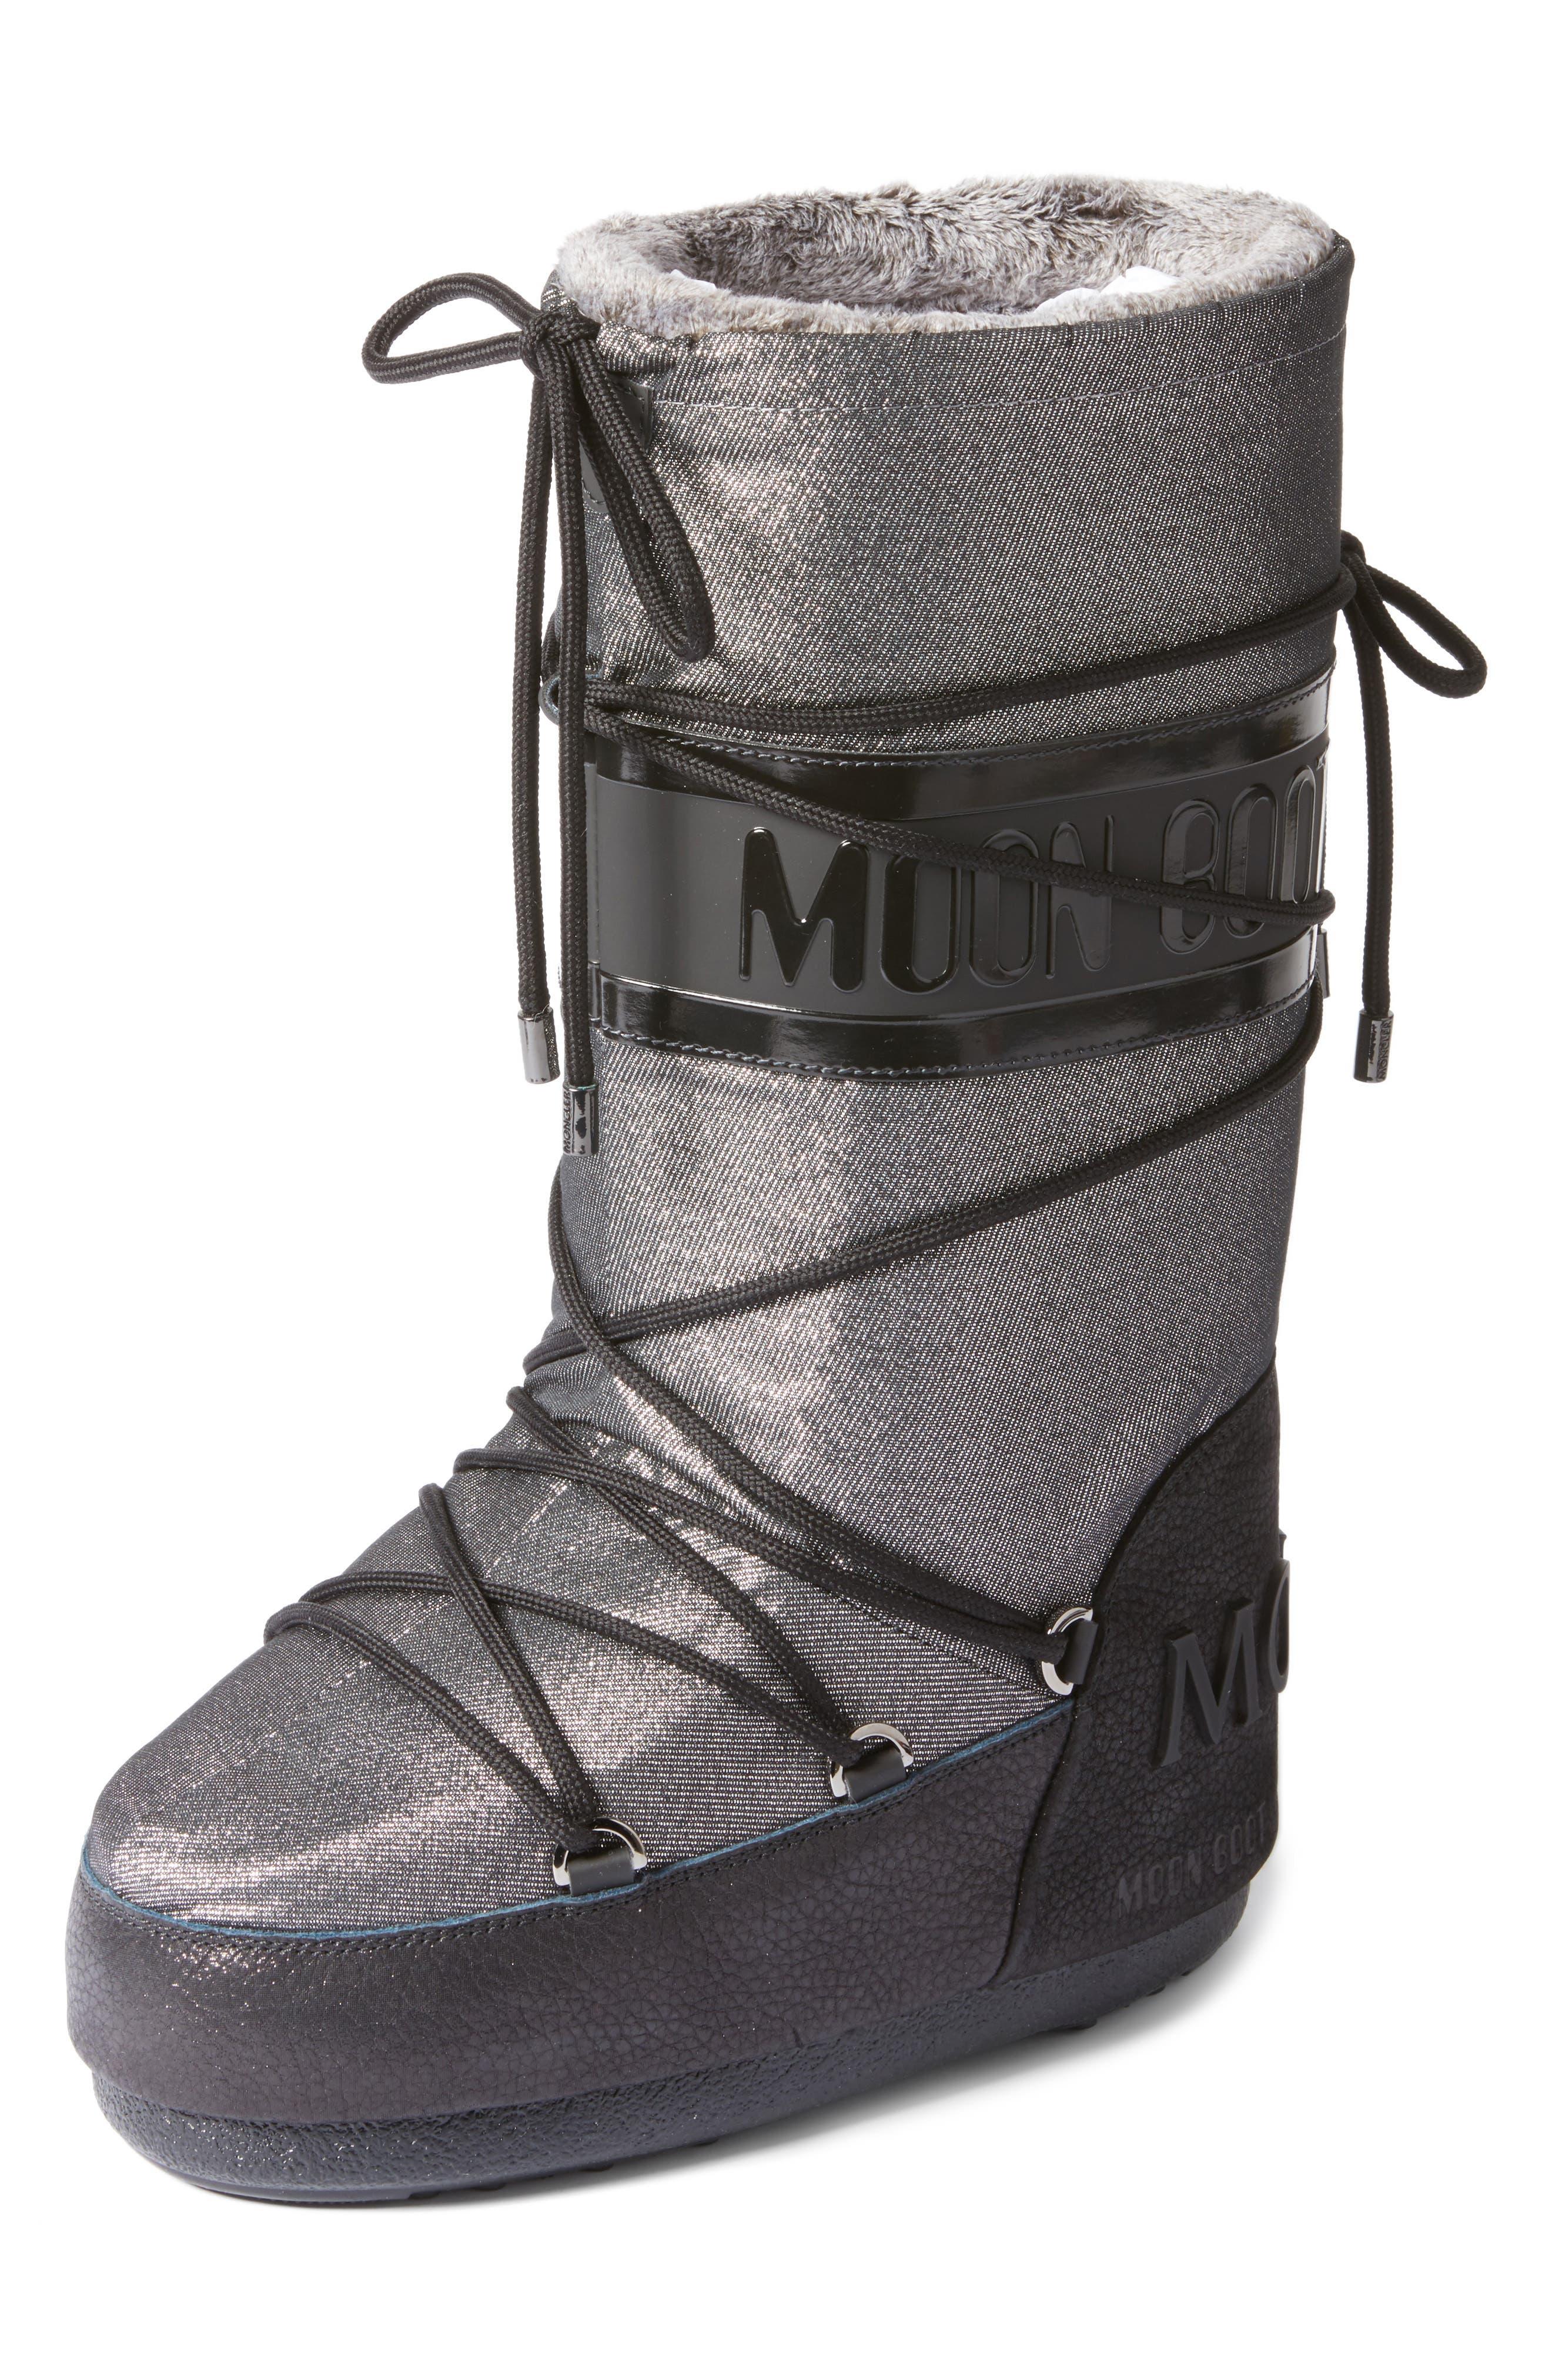 Alternate Image 1 Selected - Moncler Saturne Moon Boot (Women)